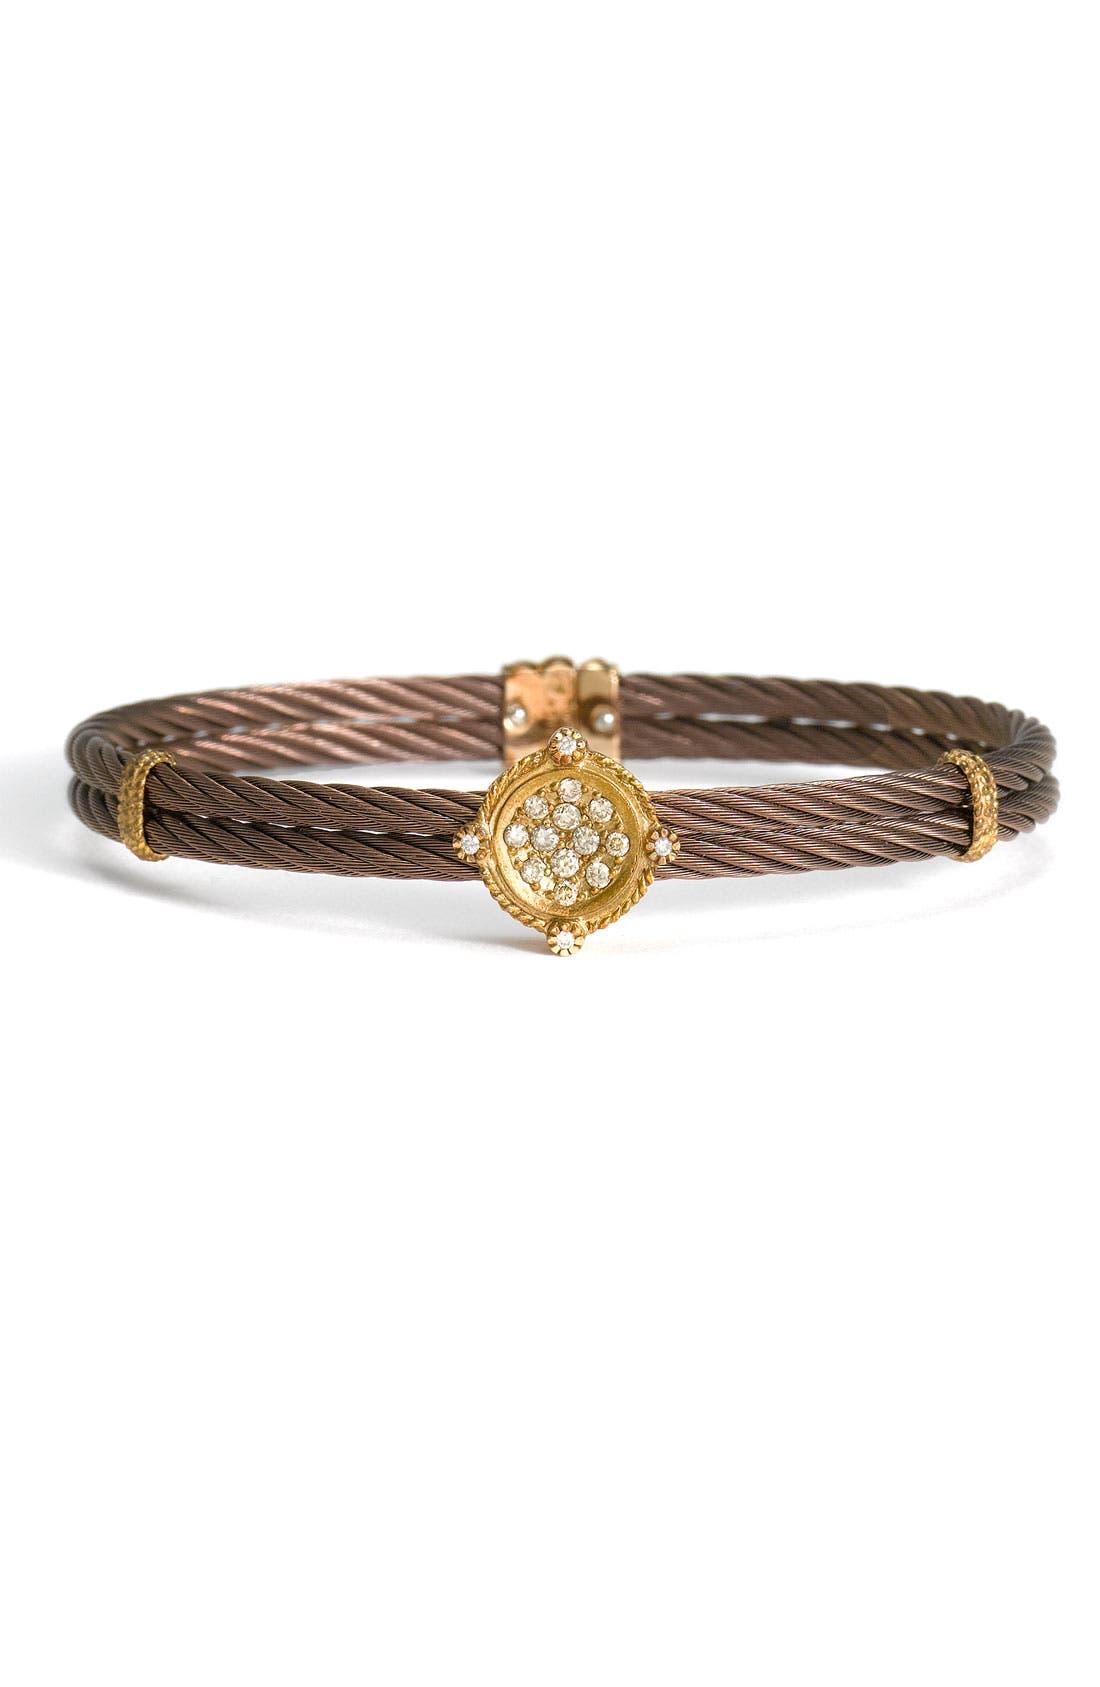 Main Image - ALOR® Champagne Diamond & Bronze Bracelet